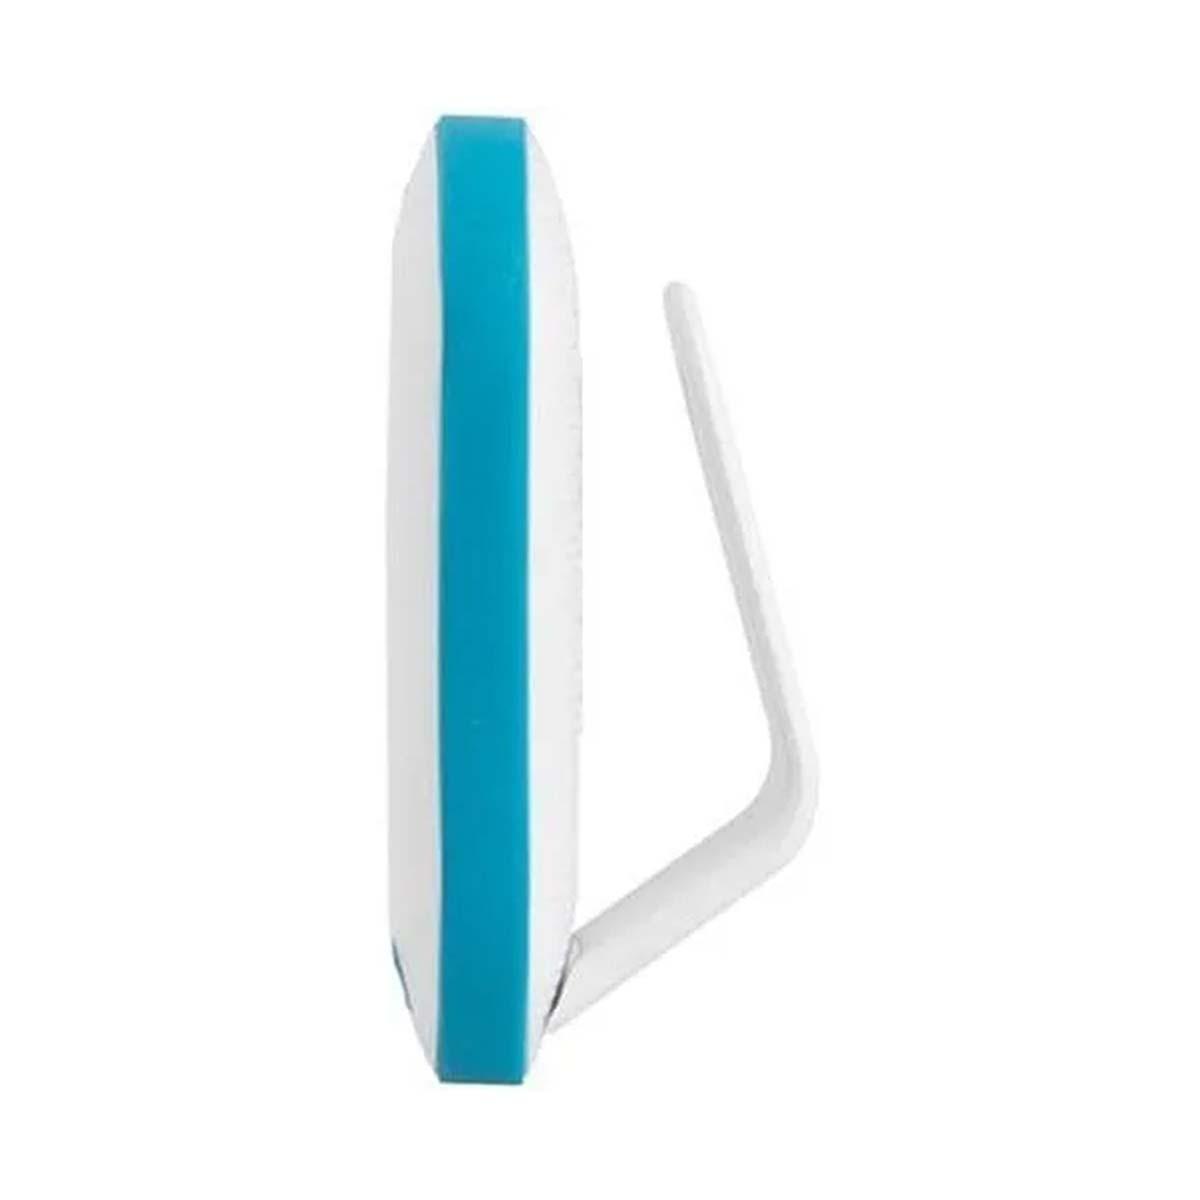 Kit 08 Controle Remoto Intelbras 433mhz Xac 4000 Smart Azul